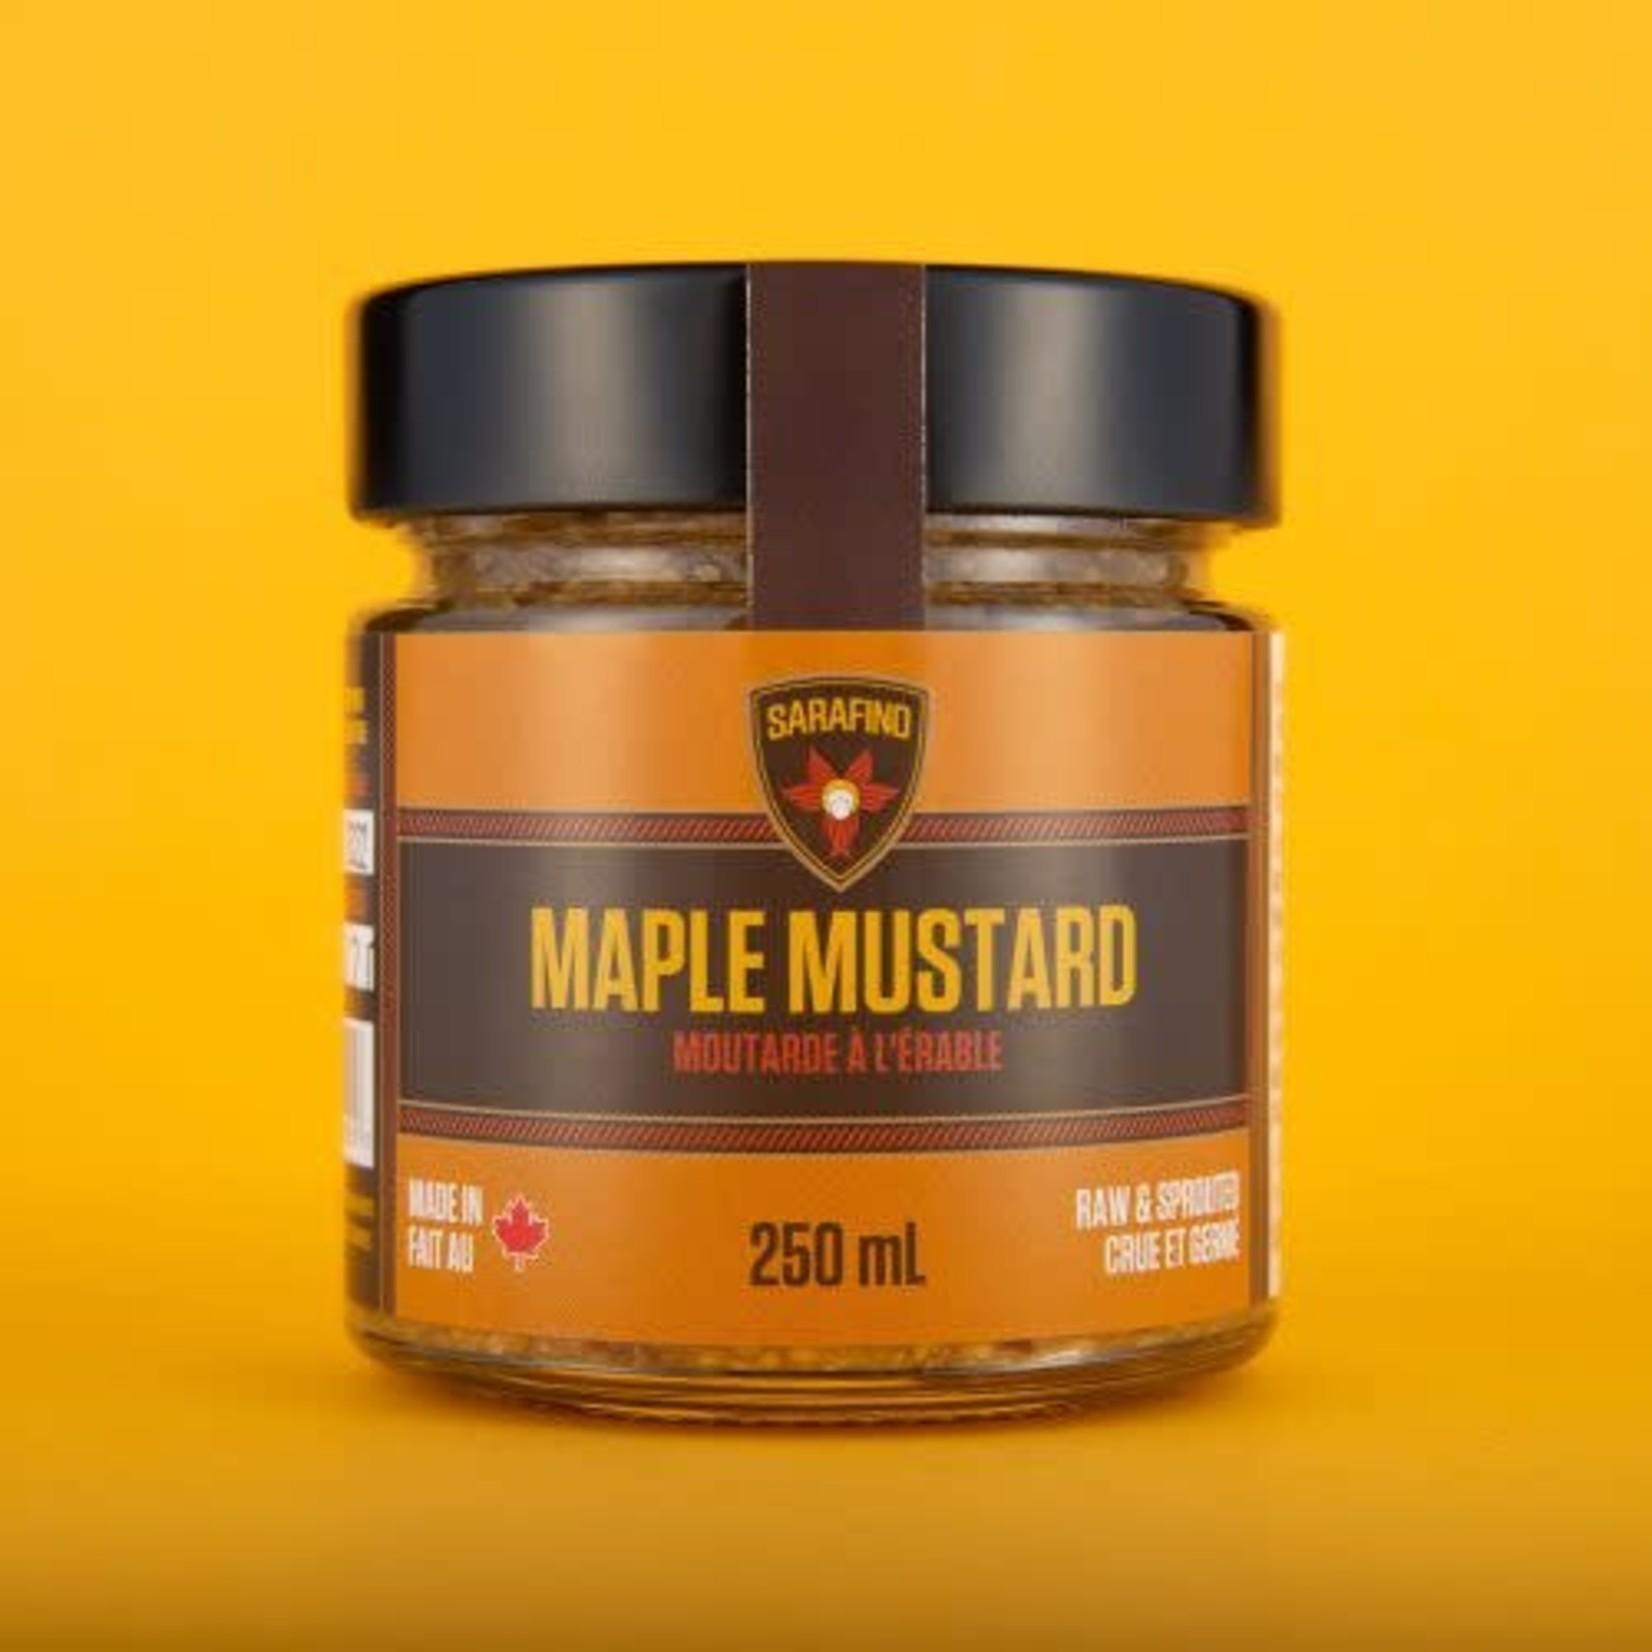 Sarafino Inc. Maple Mustard 250ml